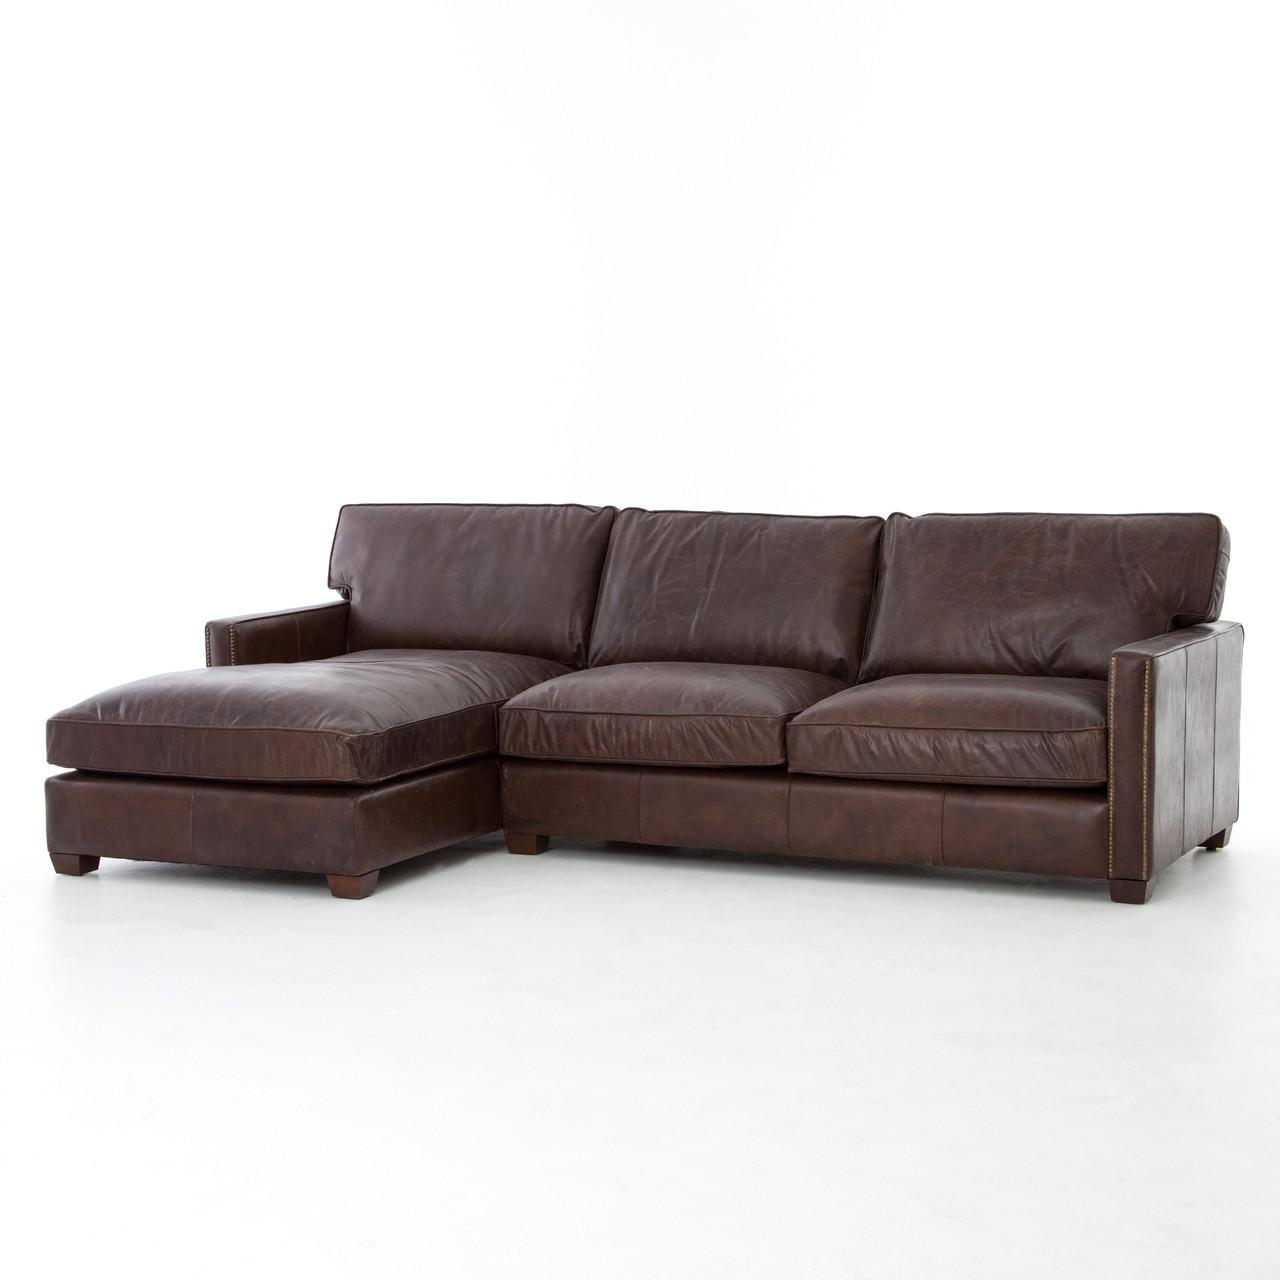 Larkin Vintage Cigar Leather Sectional Sofa with Chaise  sc 1 st  Zin Home : leather sectional sofa with chaise - Sectionals, Sofas & Couches